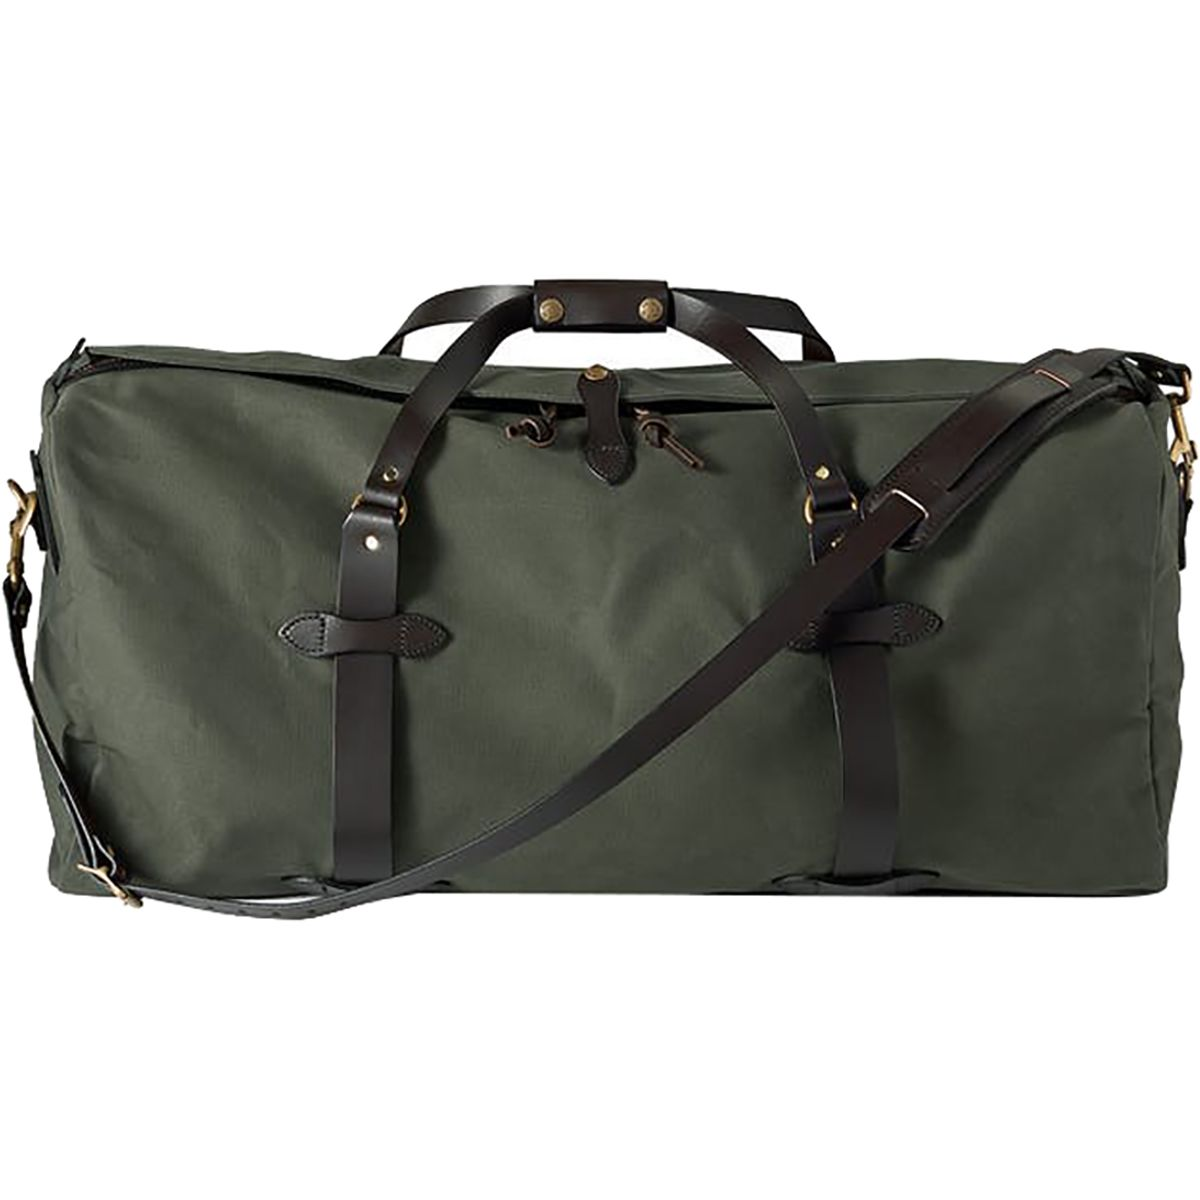 Filson Duffel Bag - Large Otter Green, One Size